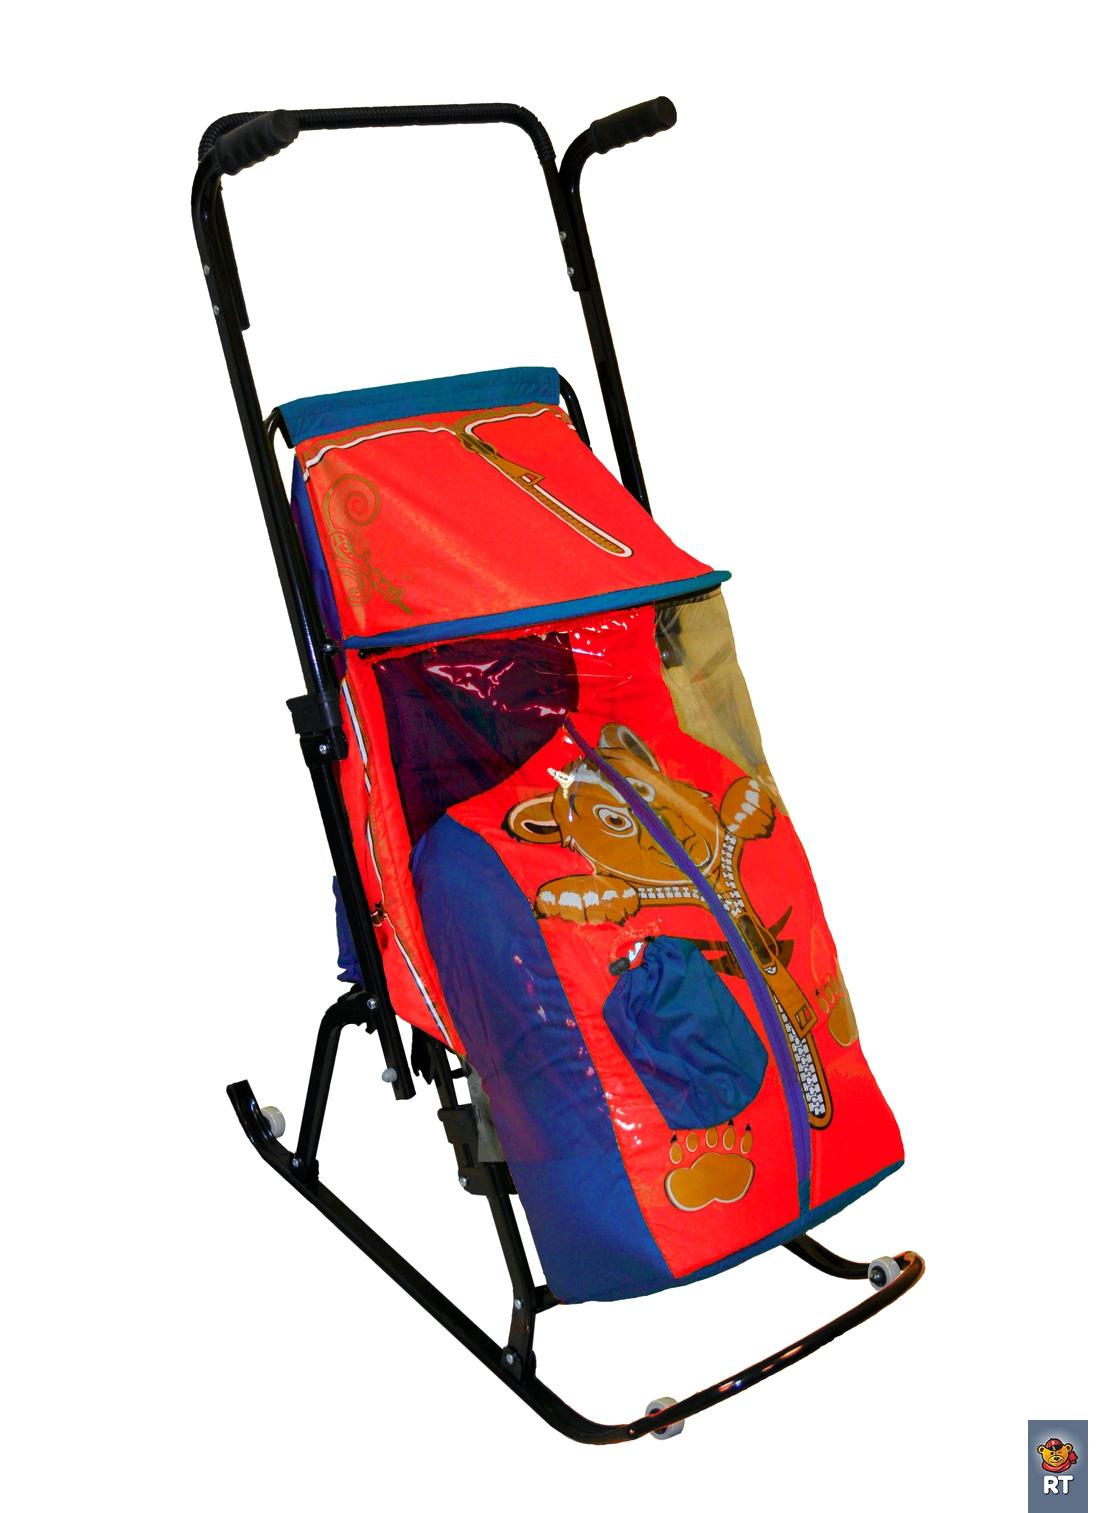 Санки-коляска Снегурочка 4-Р - Медвежонок с 4 колесиками, синий-красныйСанки и сани-коляски<br>Санки-коляска Снегурочка 4-Р - Медвежонок с 4 колесиками, синий-красный<br>